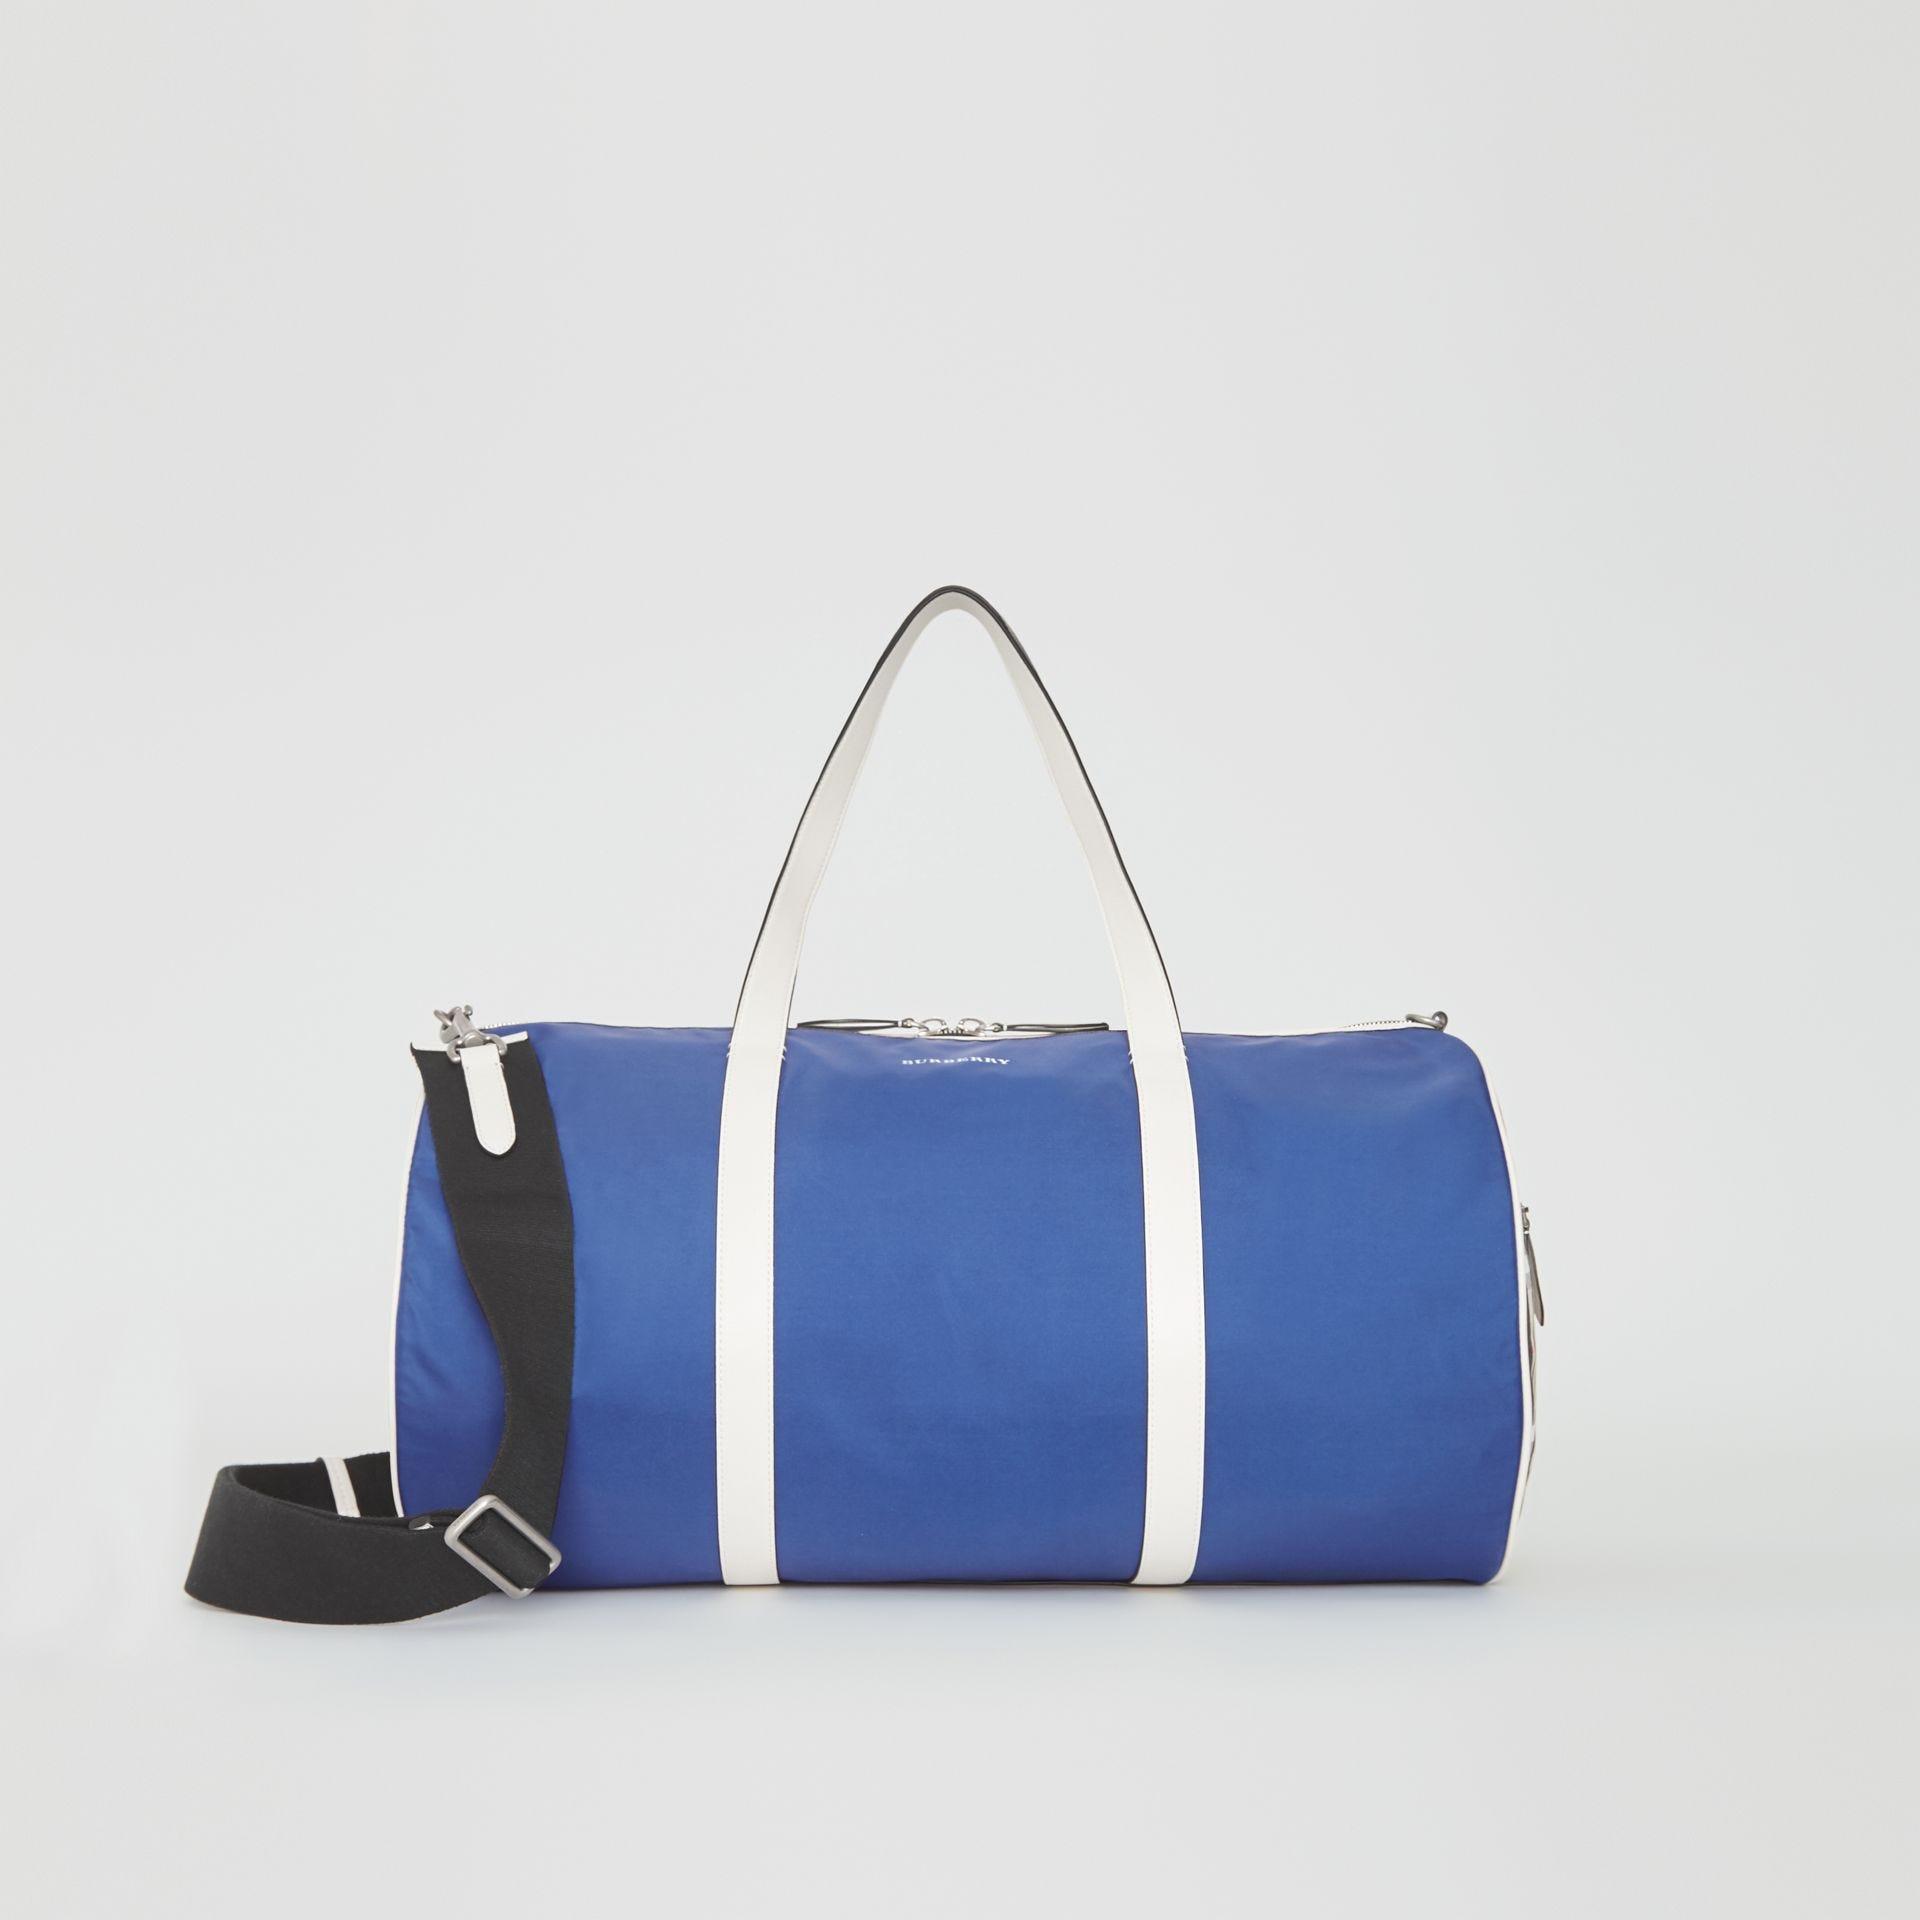 435b5bcc1e21 Burberry. Large Color Block Vintage Check Barrel Bag